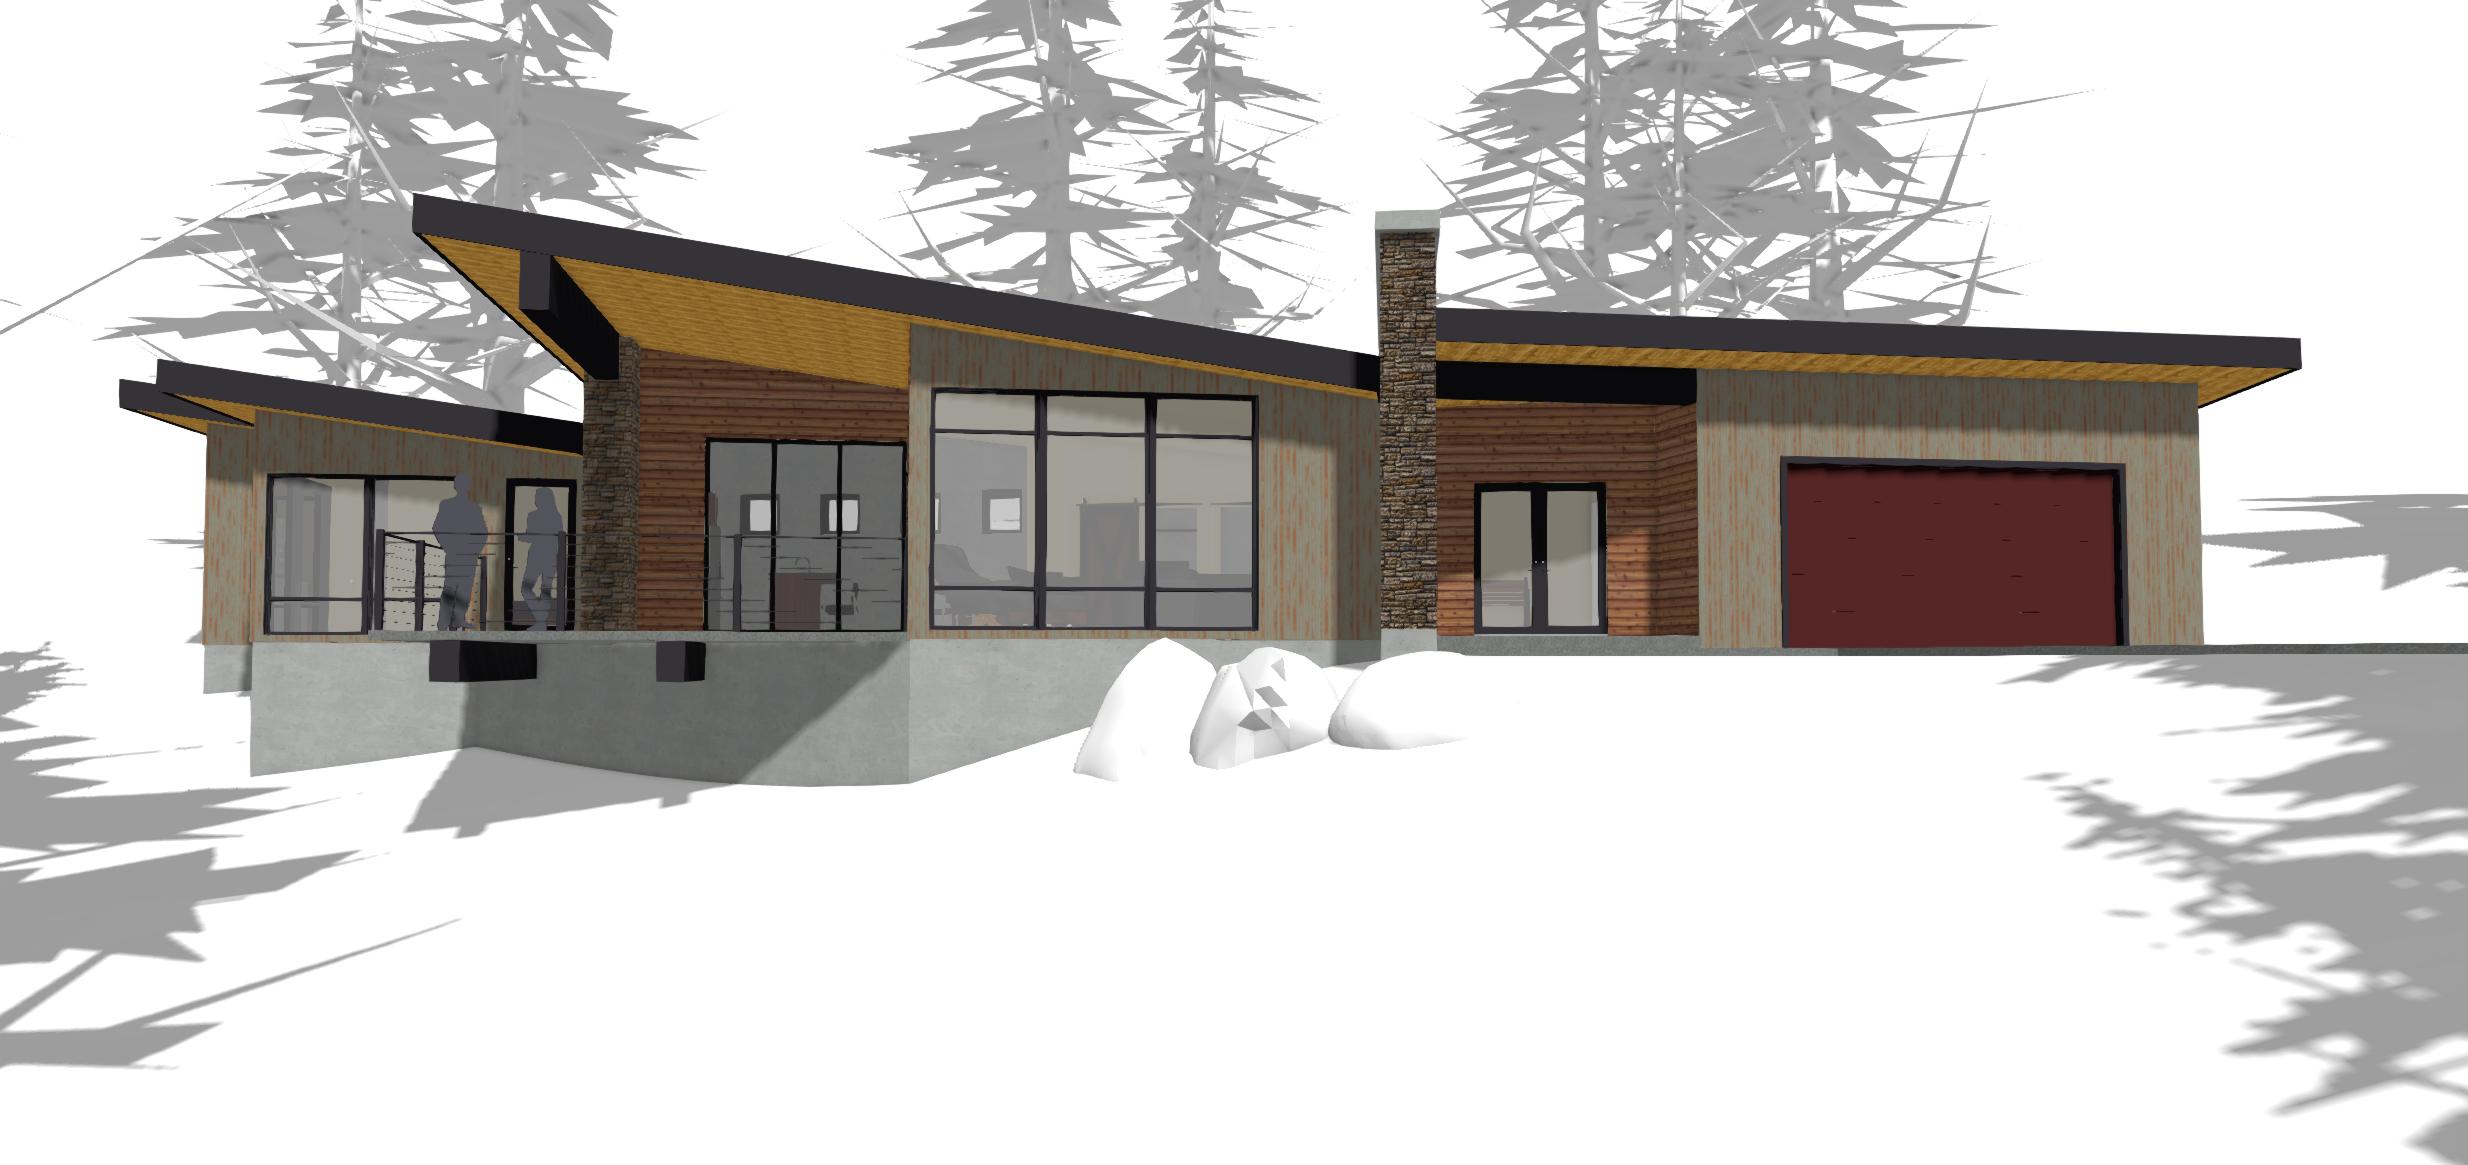 Residential design for mountain homes